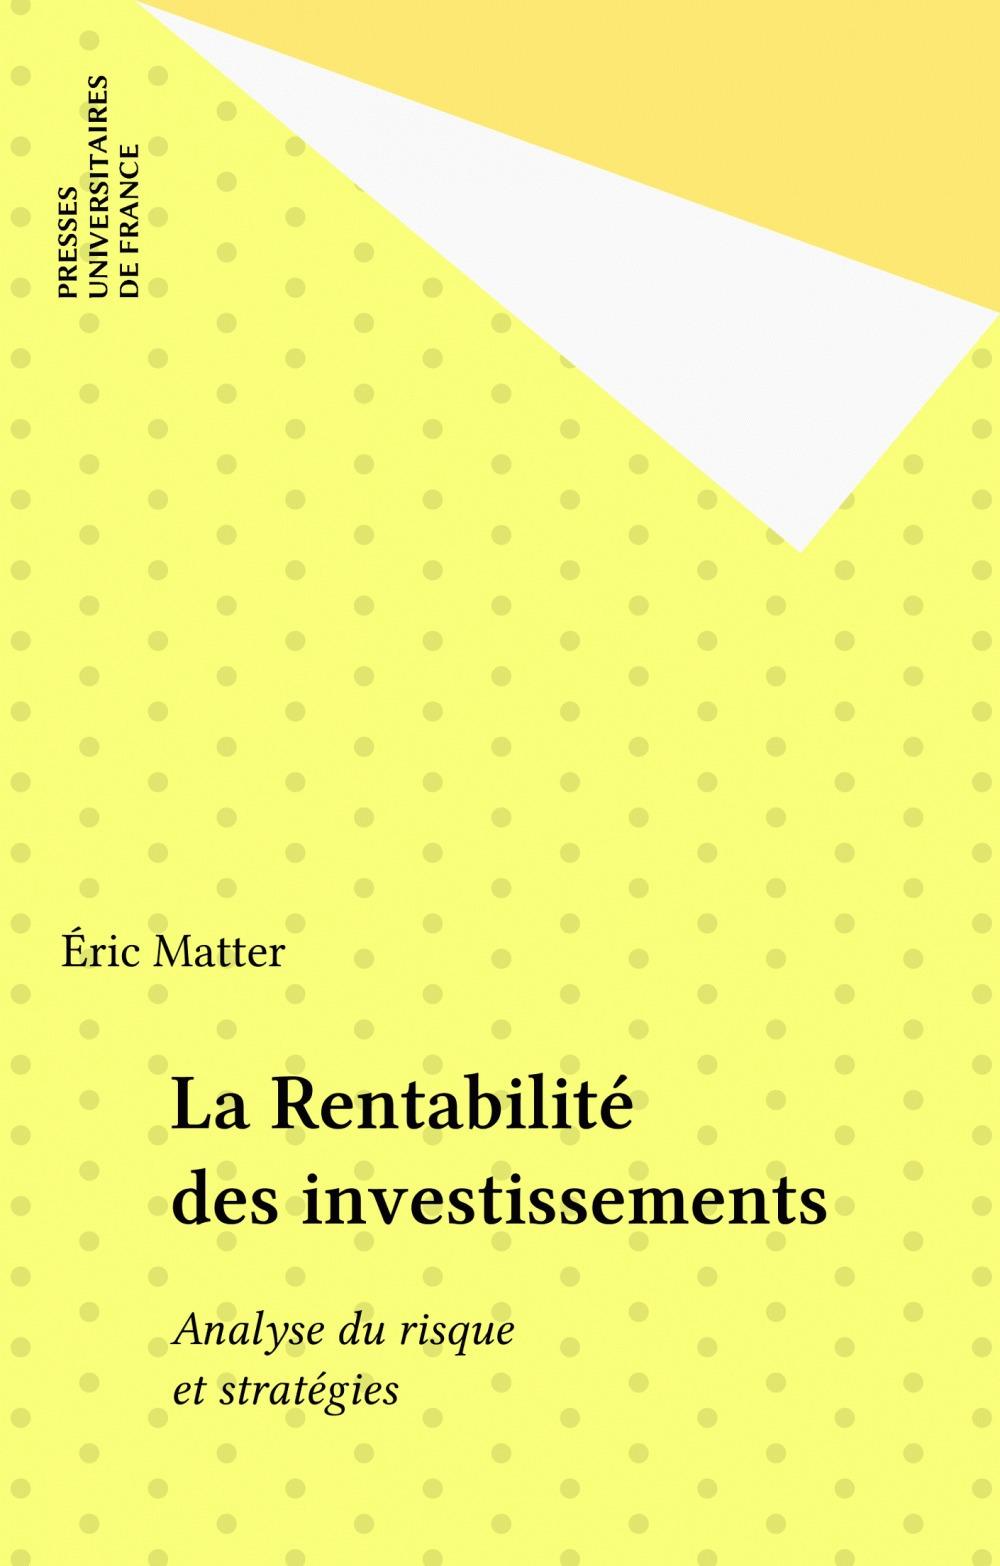 La rentabilite des investissements